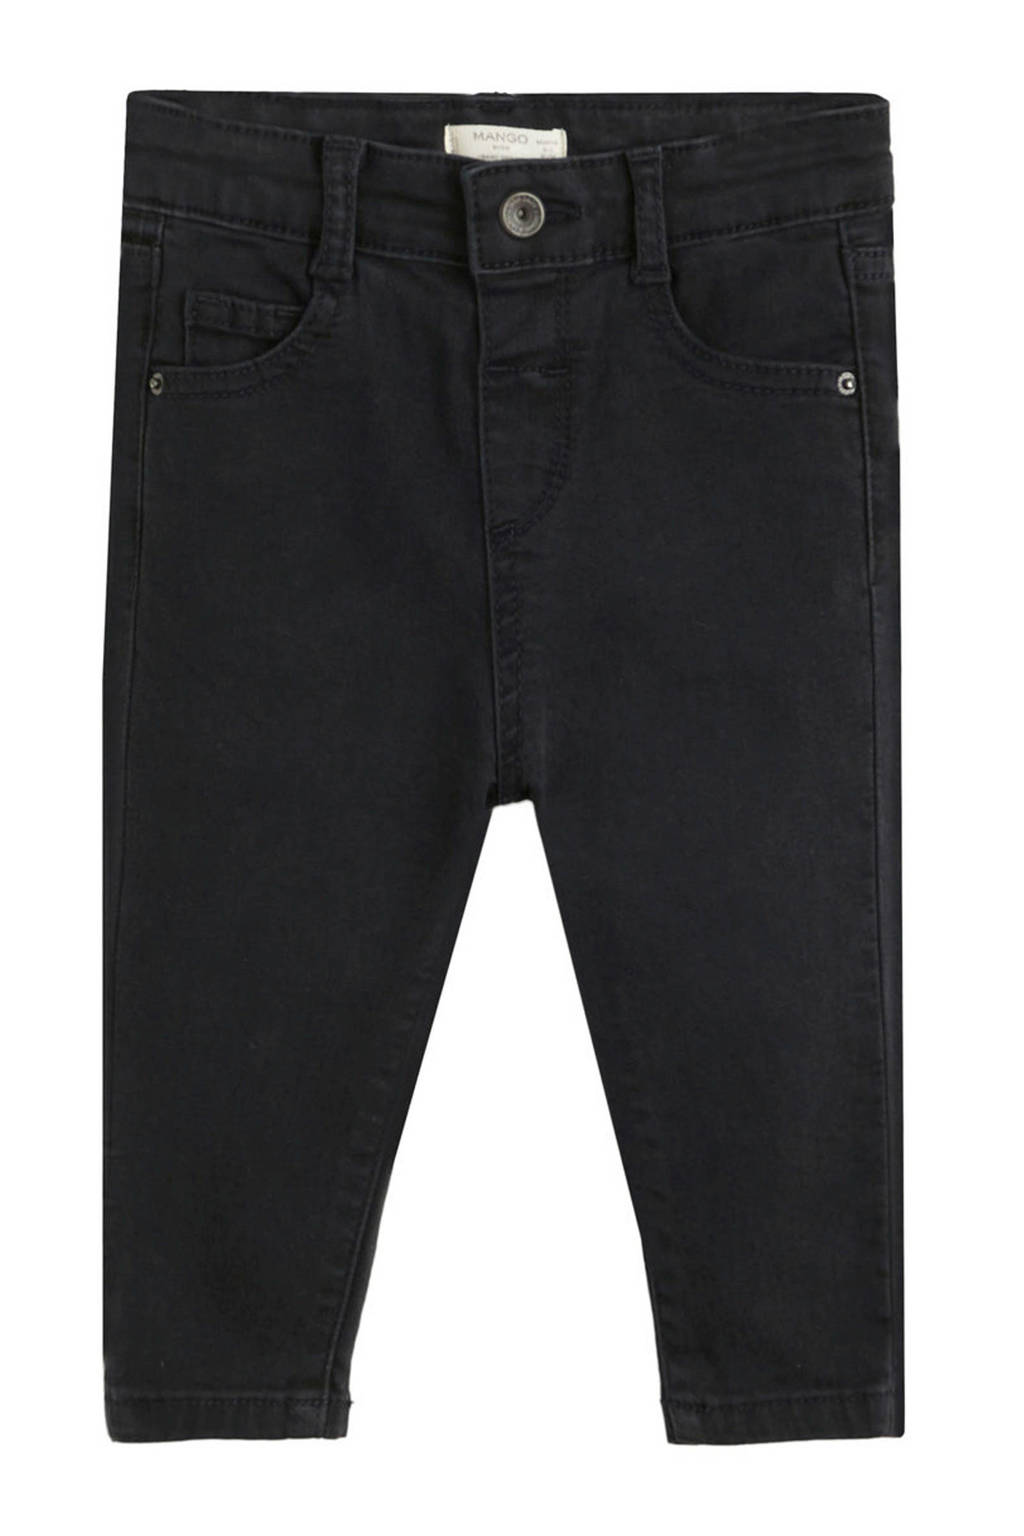 Mango Kids baby high waist skinny jeans, Zwart